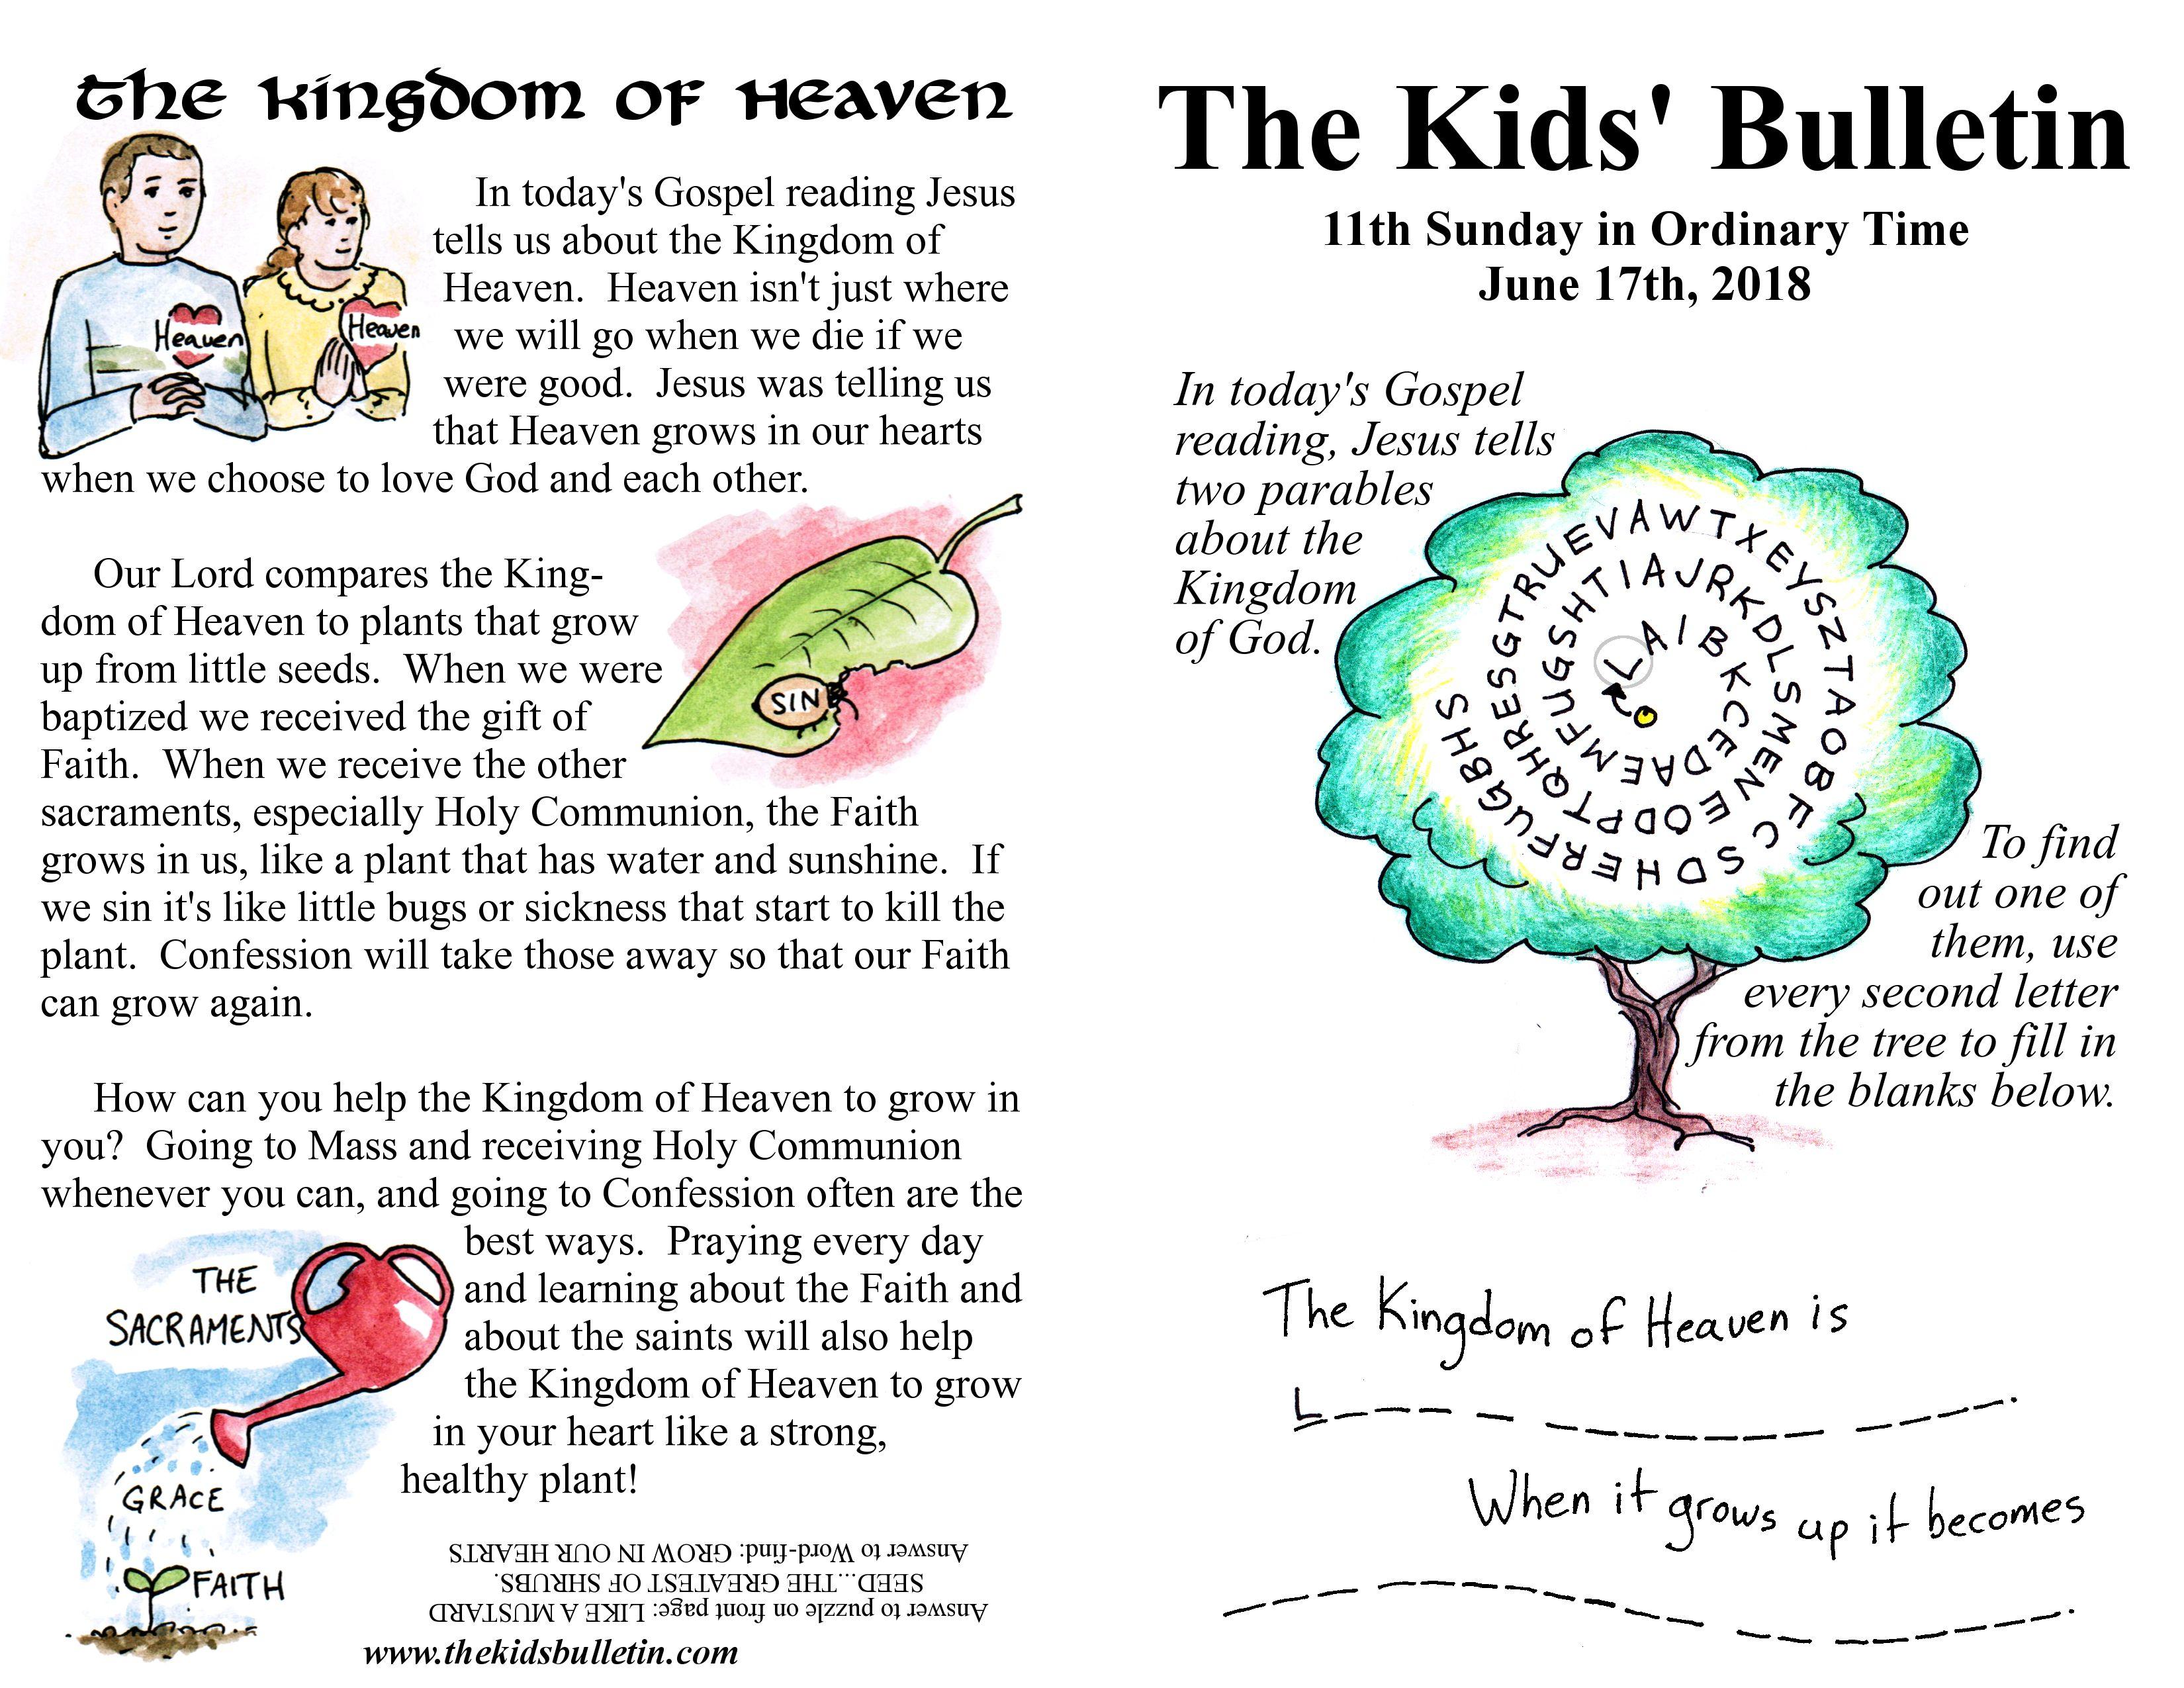 The Kids Bulletin For Sunday June 17th